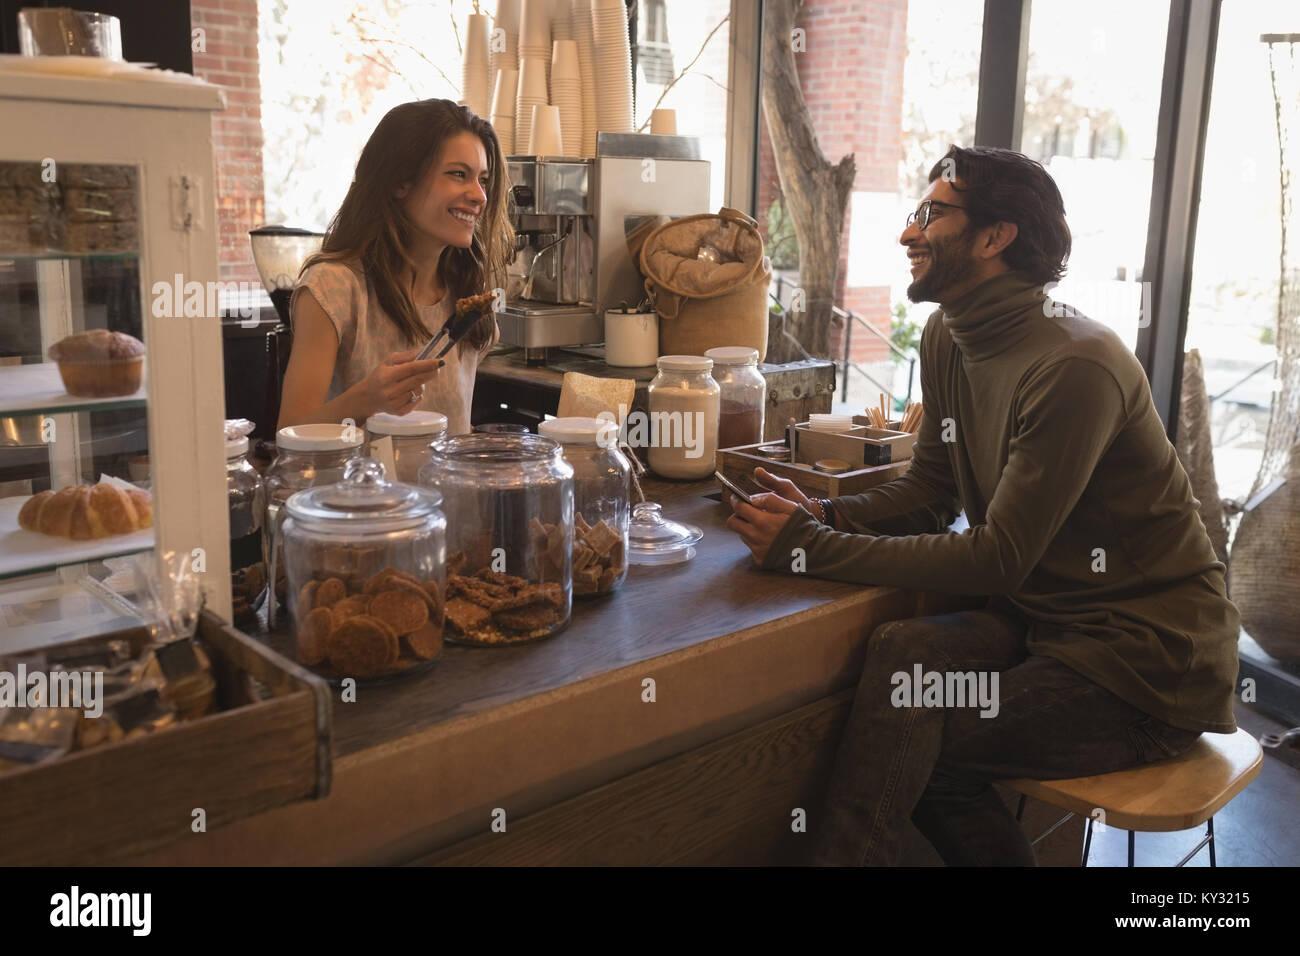 Smiling waitress talking to customer - Stock Image